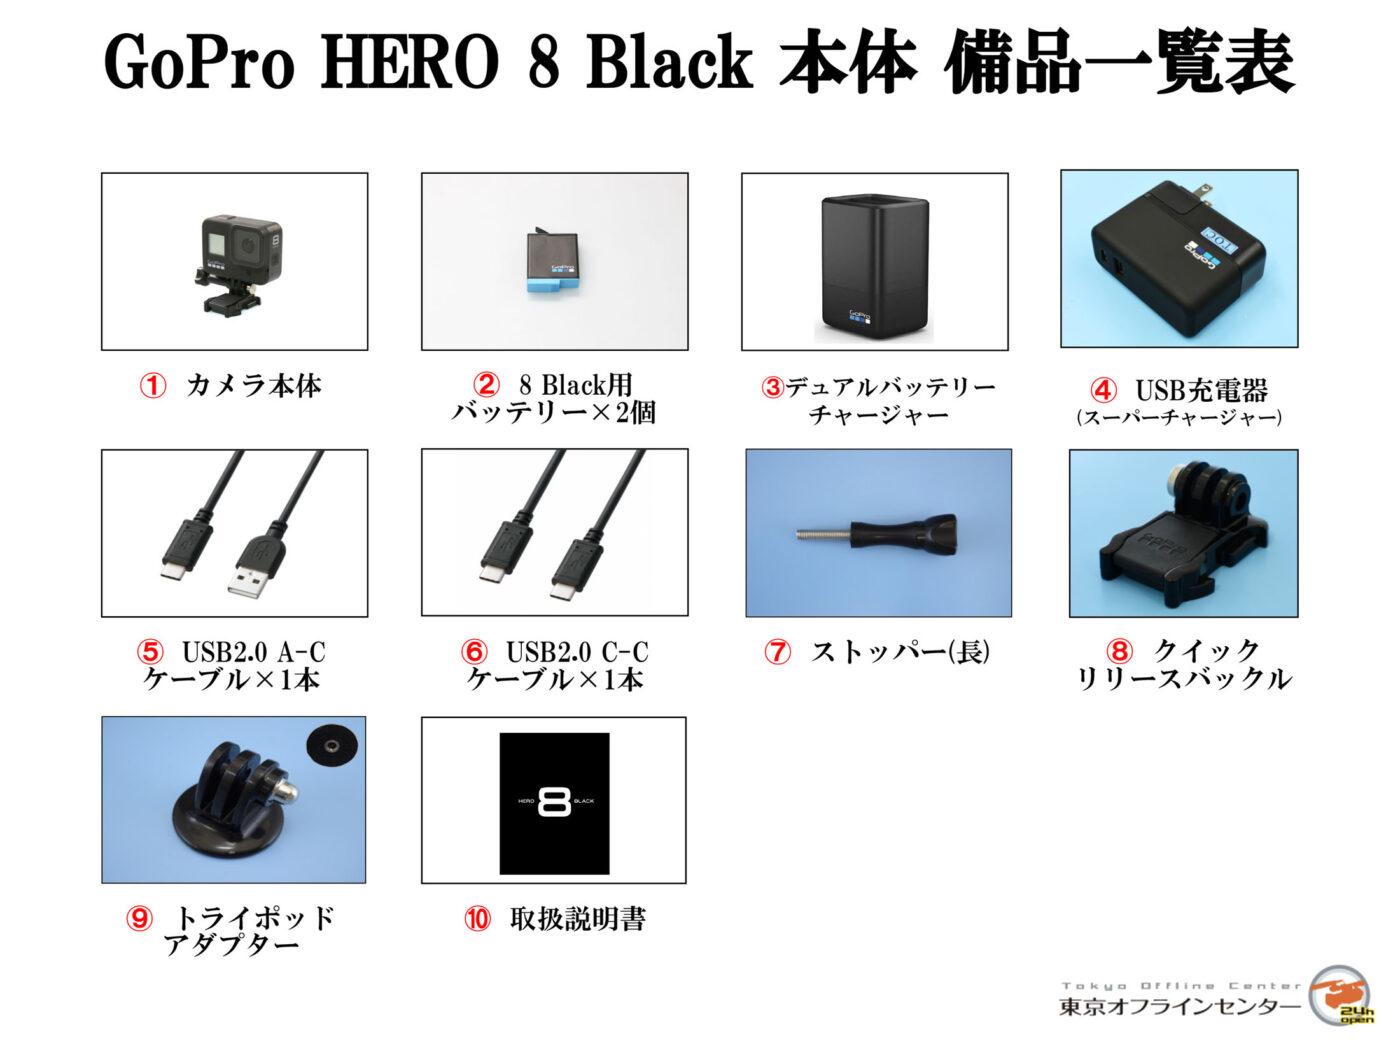 GoPro HERO8 Black 備品一覧